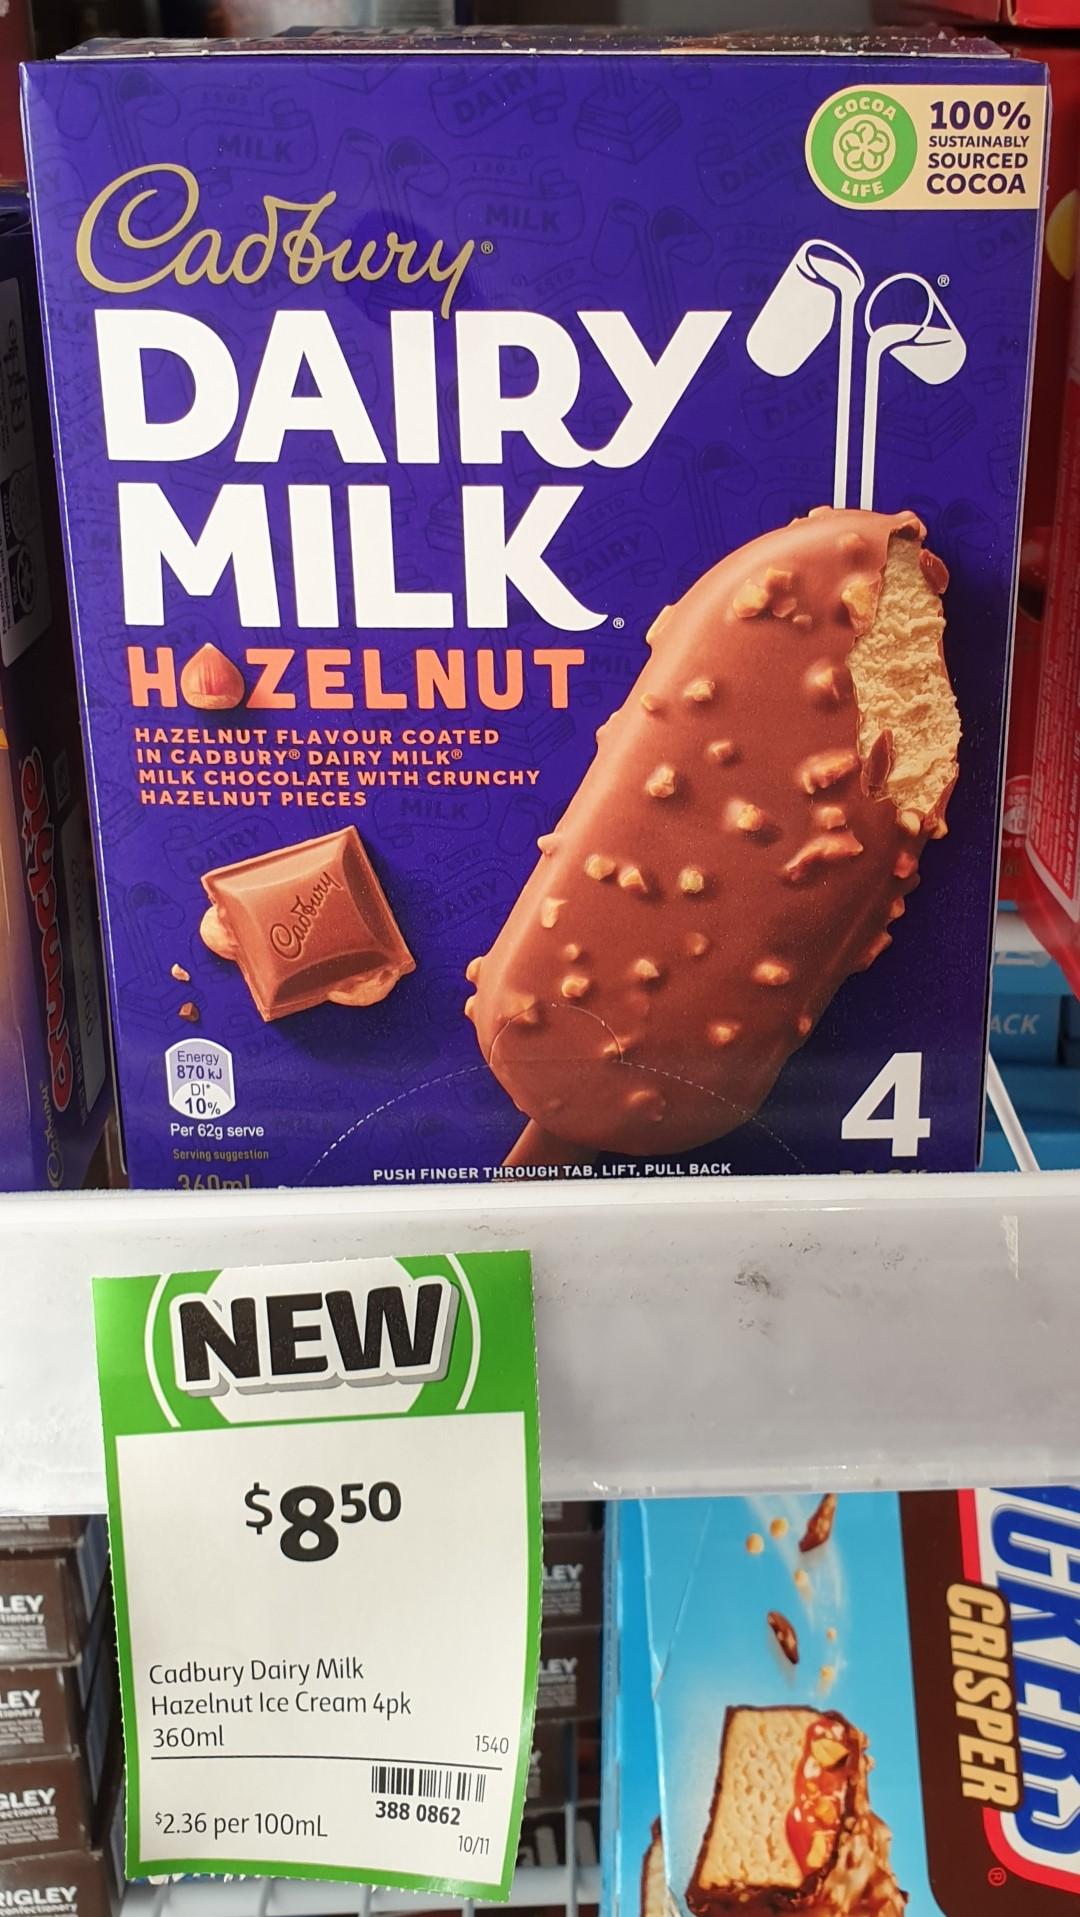 Cadbury 360mL Dairy Milk Ice Cream Hazelnut